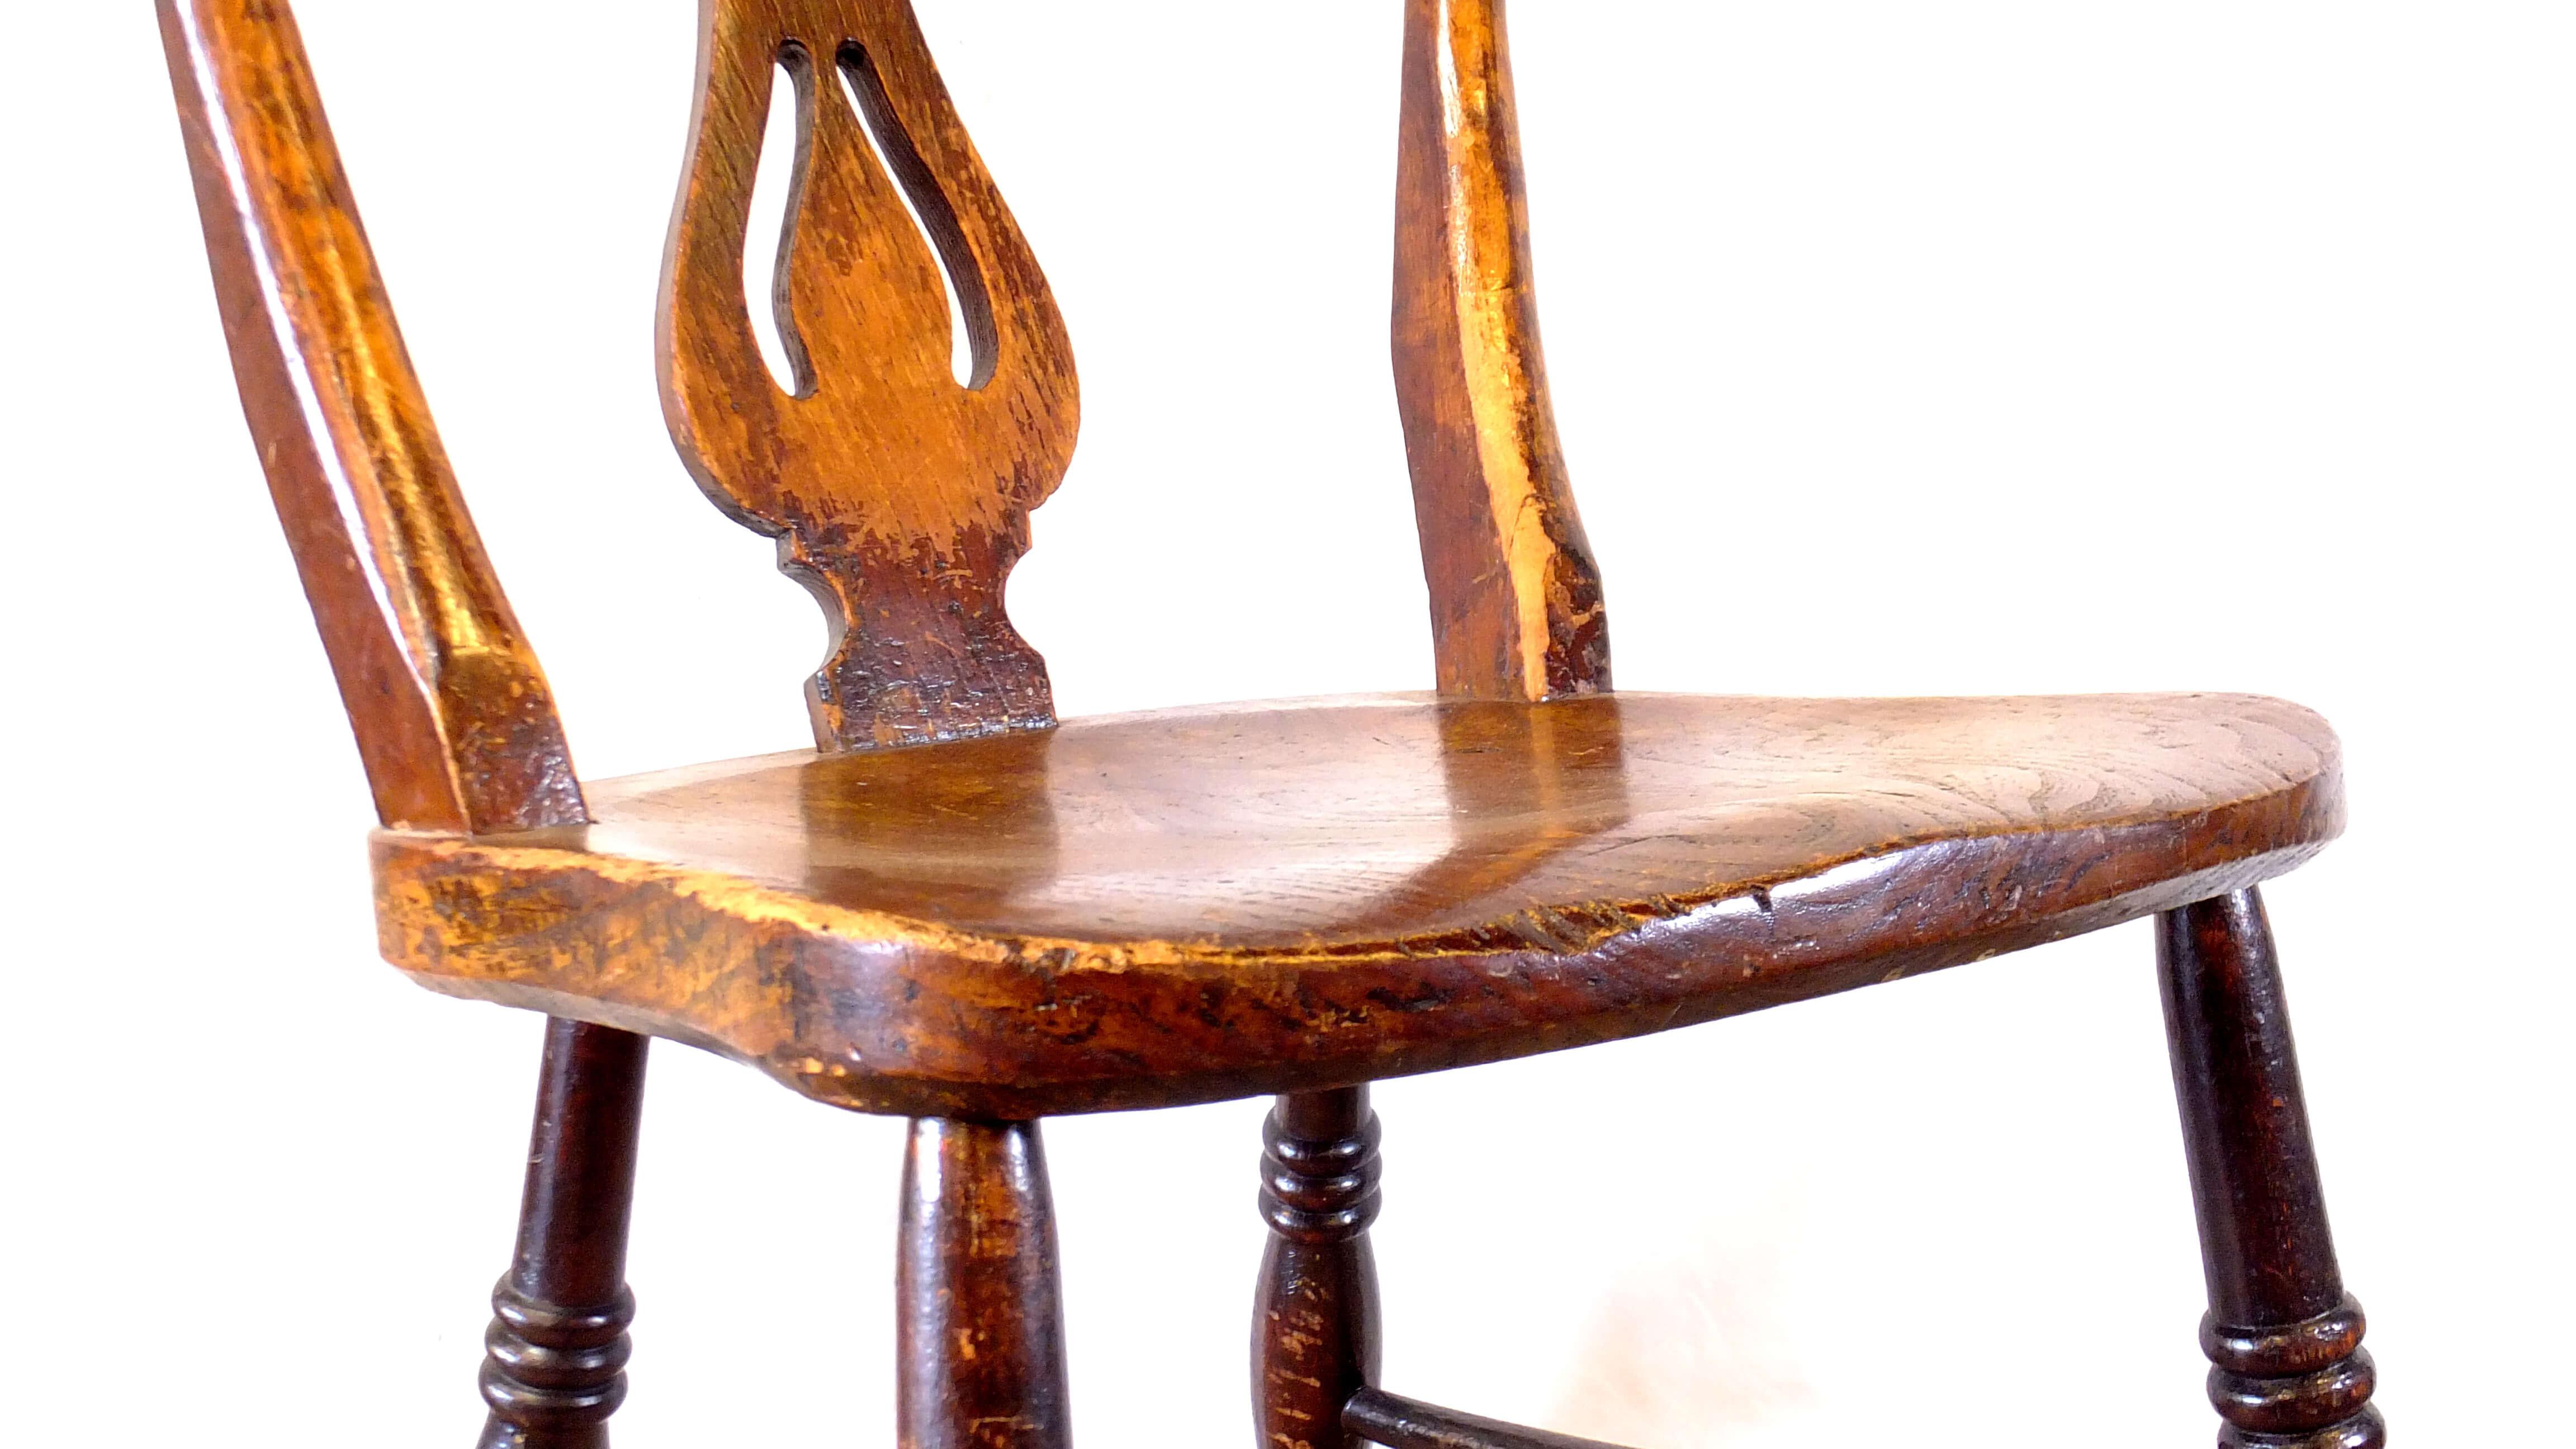 UK ANTIQUE GATE LEG TABLE & CHAIR / イギリス アンティーク 折りたたみテーブル・チェアセット